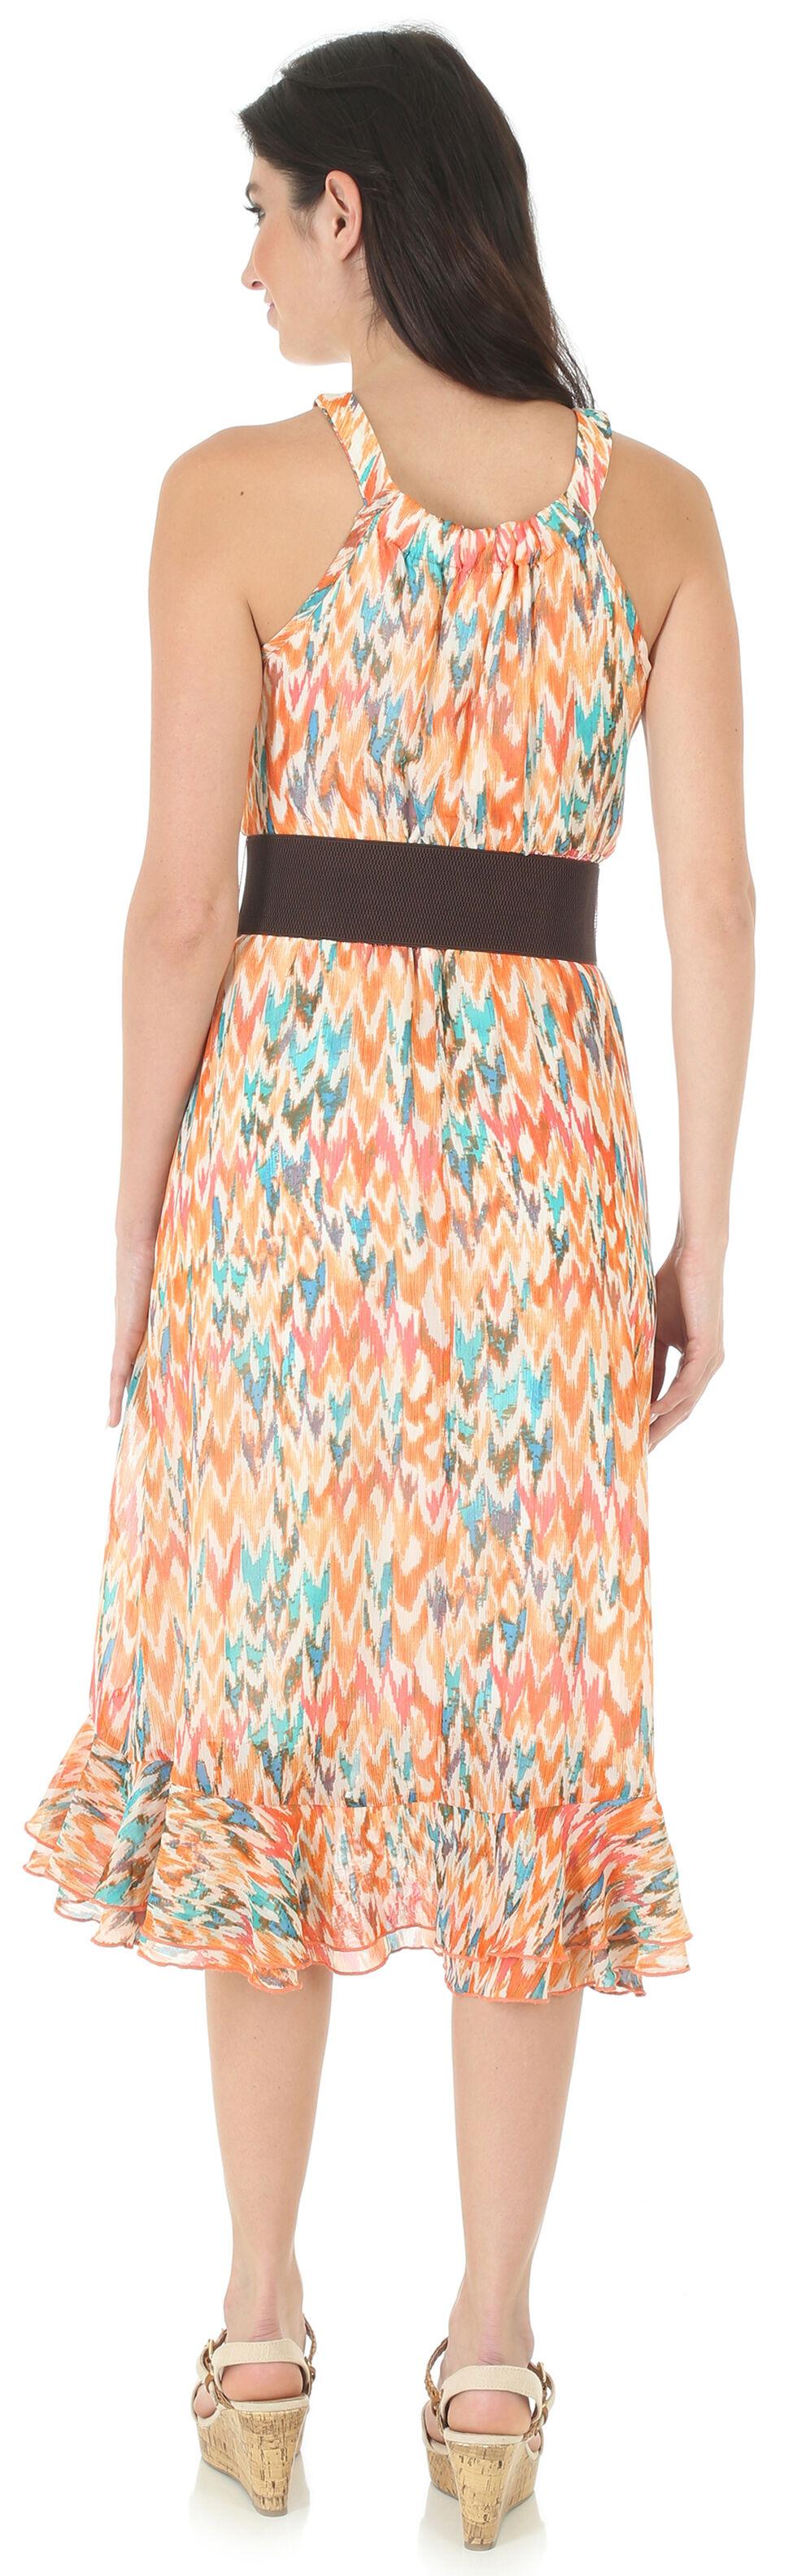 Wrangler Rock 47 Women's Multi Sleeveless Ruffle Hem Dress, Multi, hi-res